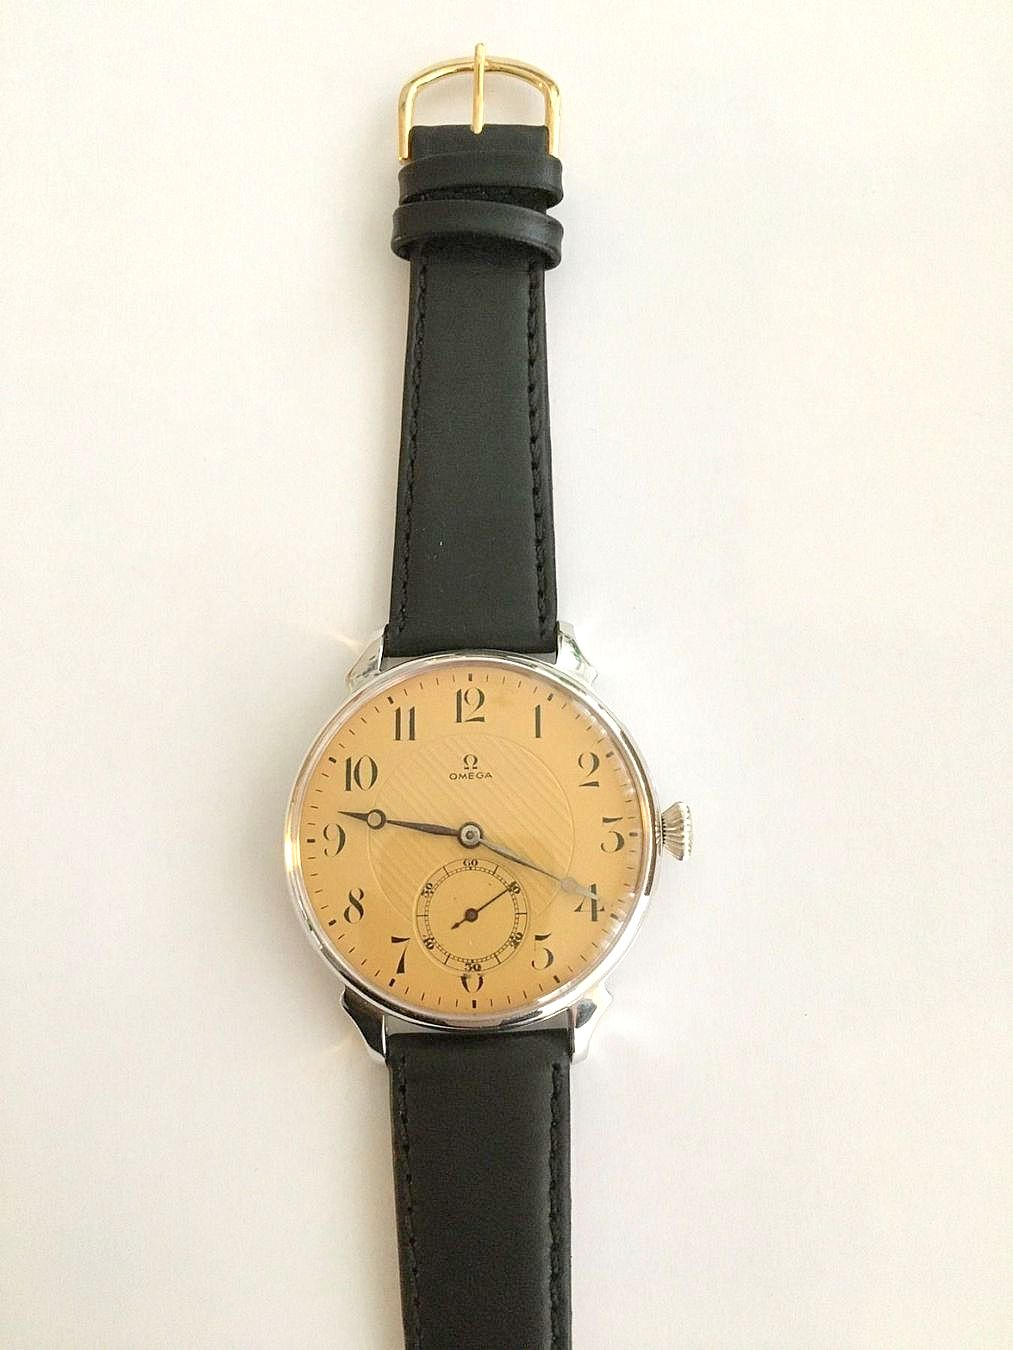 Omega / Marriage Watch - Transparent Large 46 mm - Gentlemen's Steel Wrist Watch - Image 2 of 3